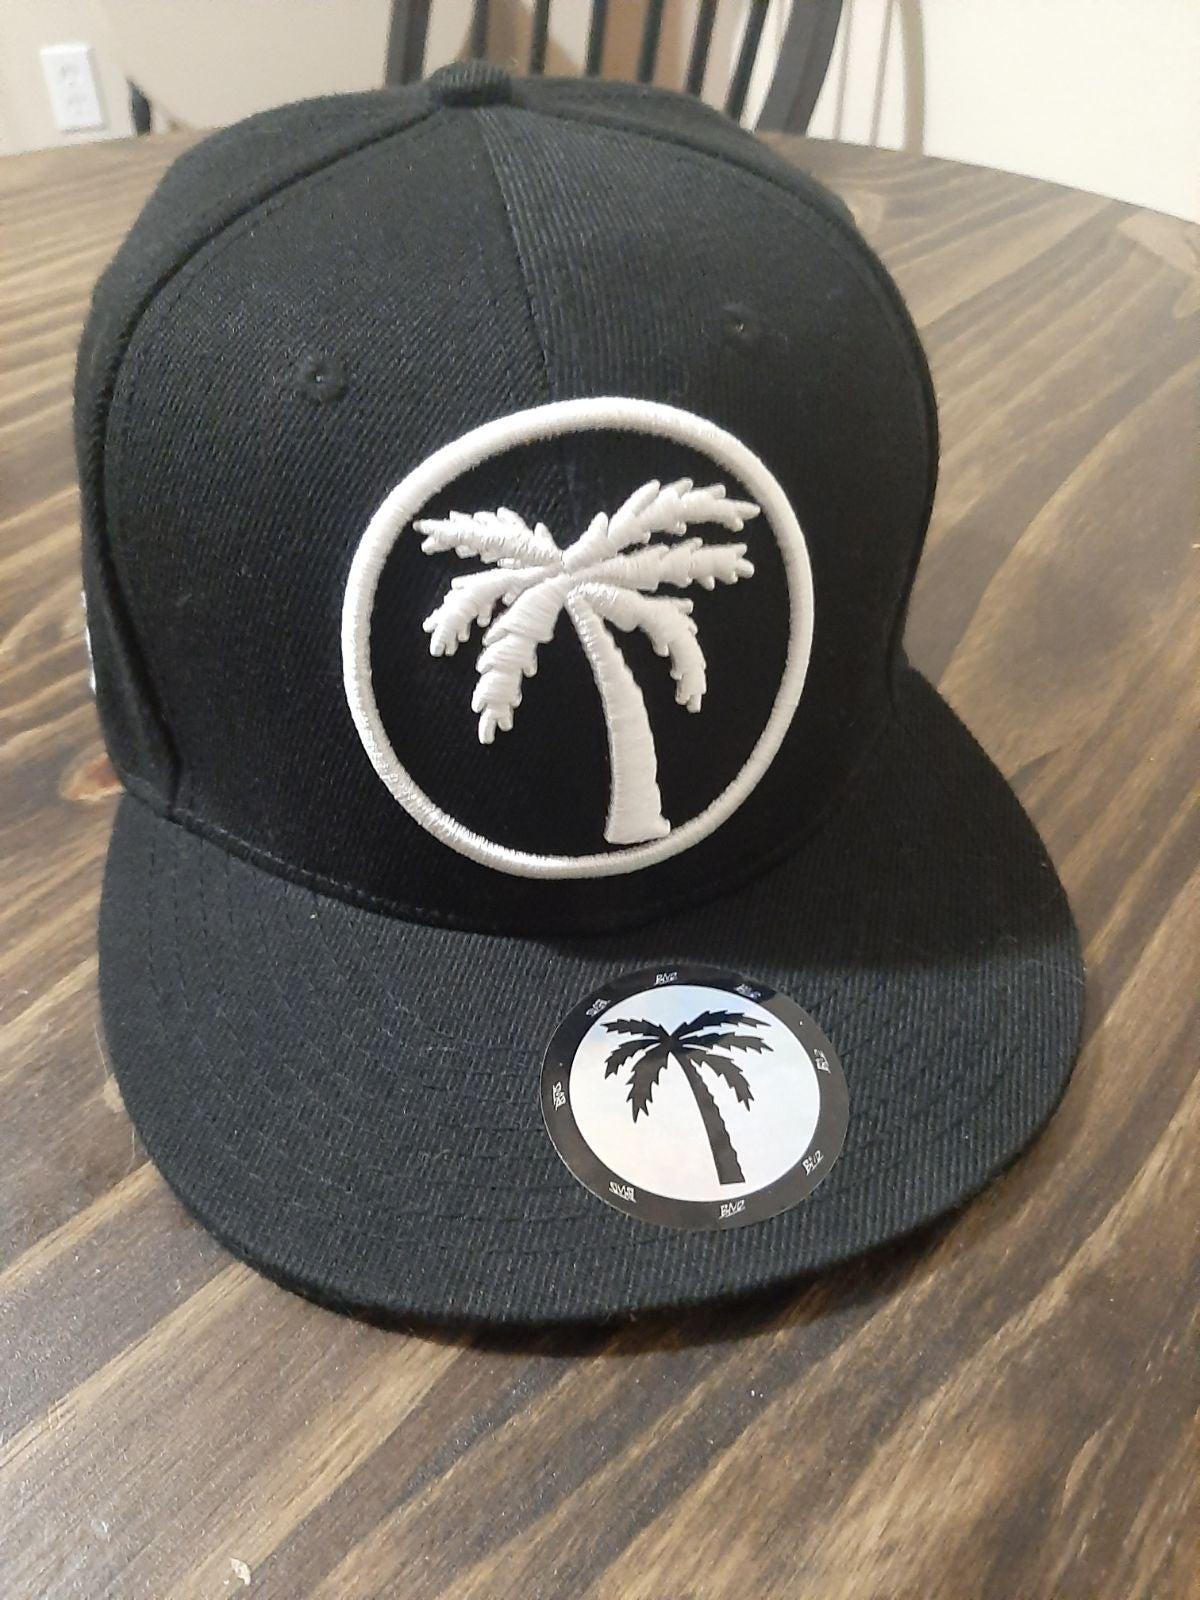 BLVD Supply Co. snap back hat